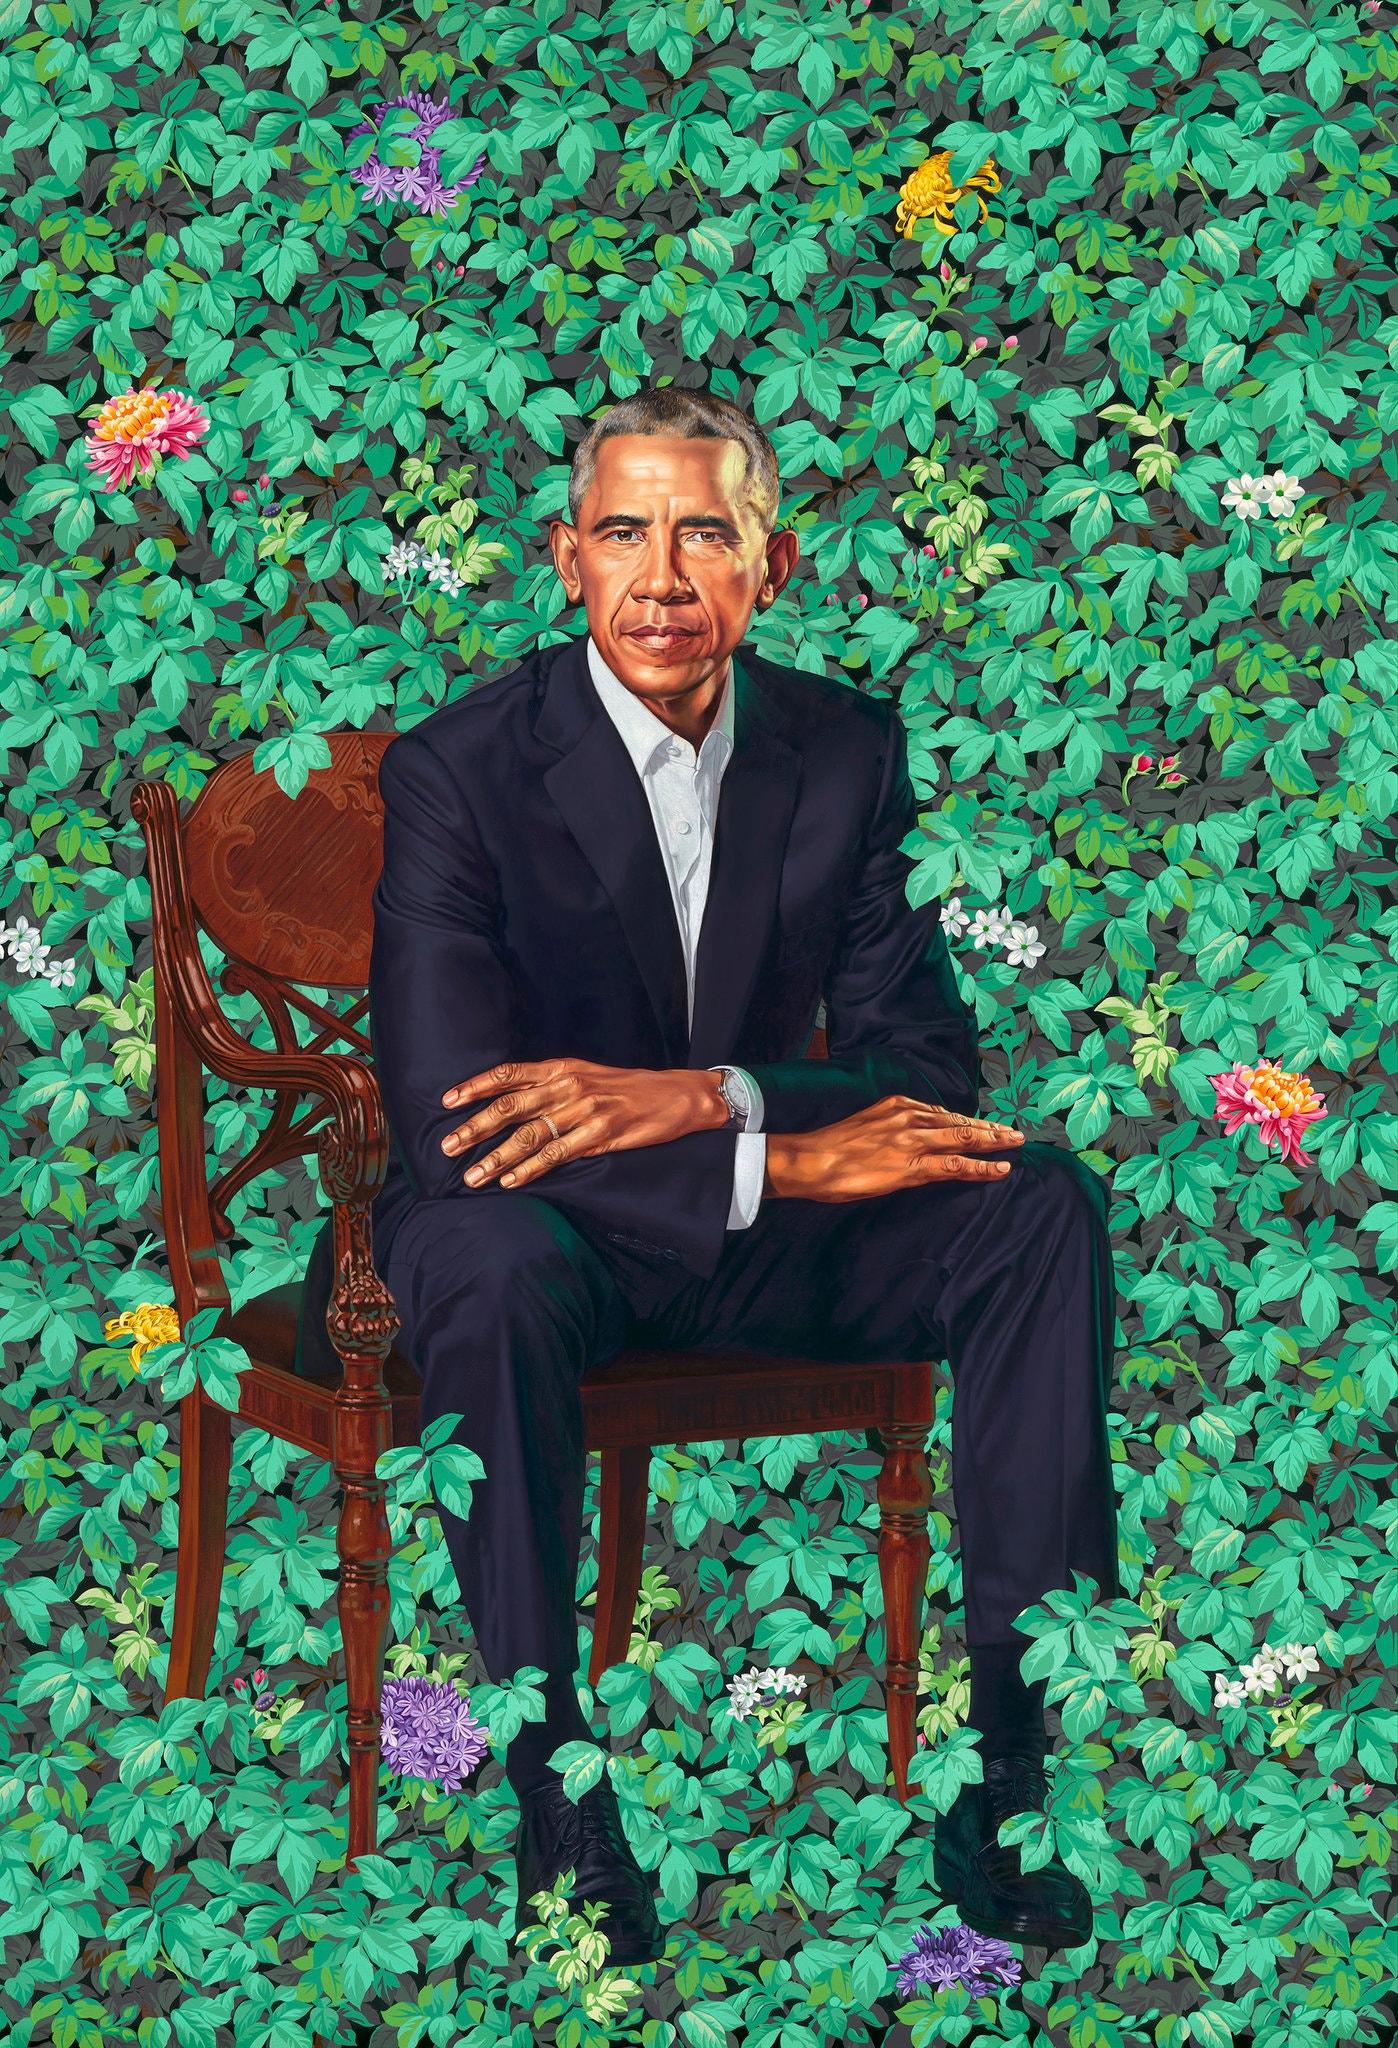 Portrait of former President Barack Obama by Kehinde Wiley